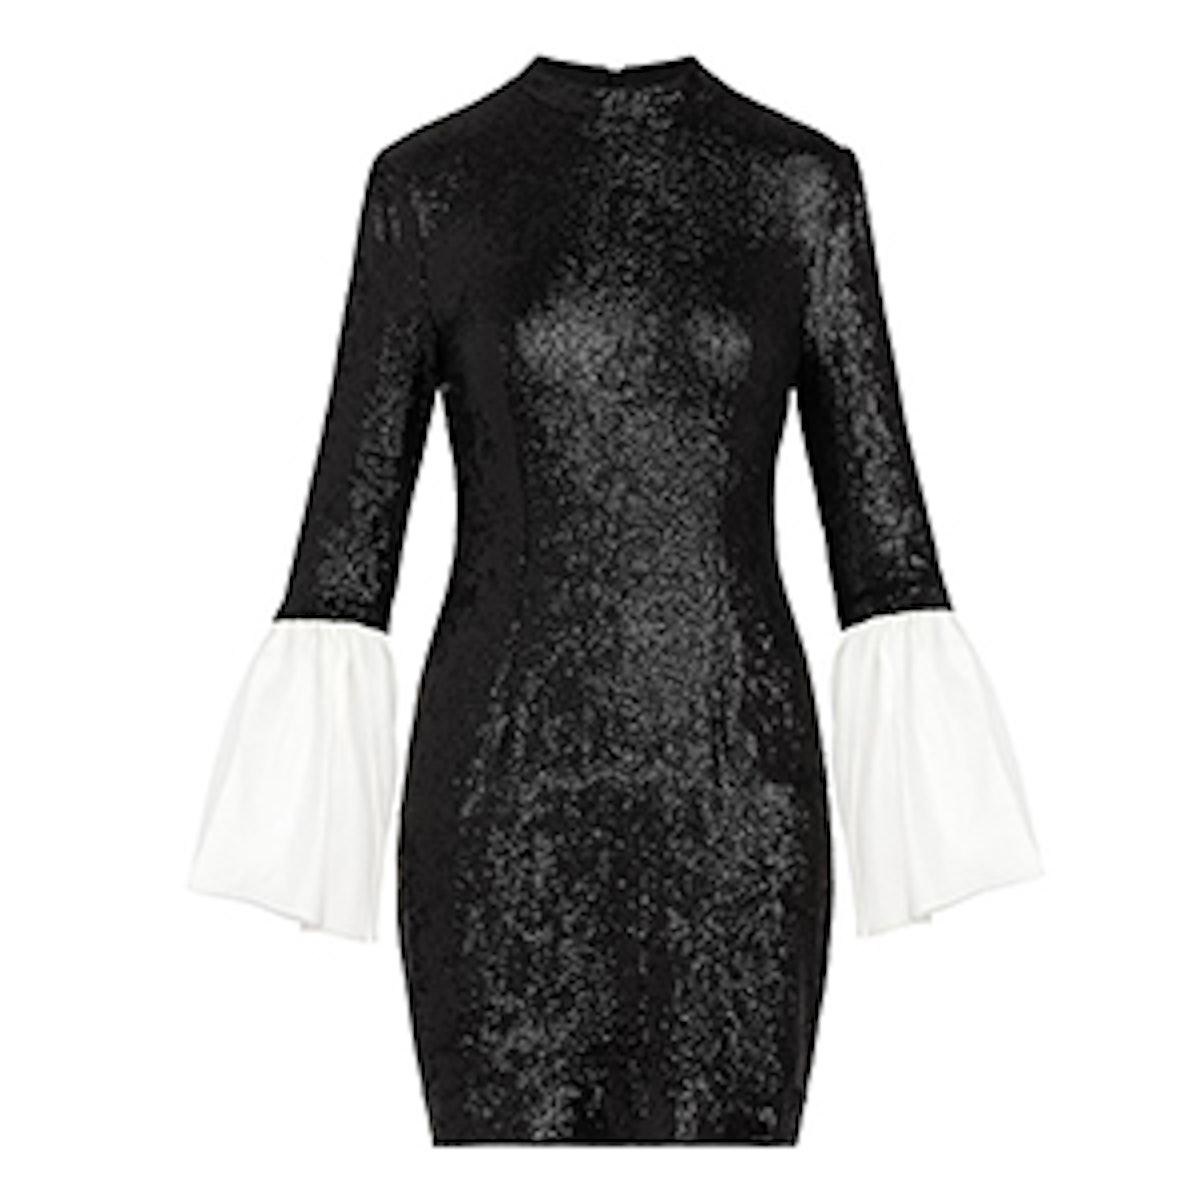 Wes Bell-Sleeve Fluid Sequin Dress